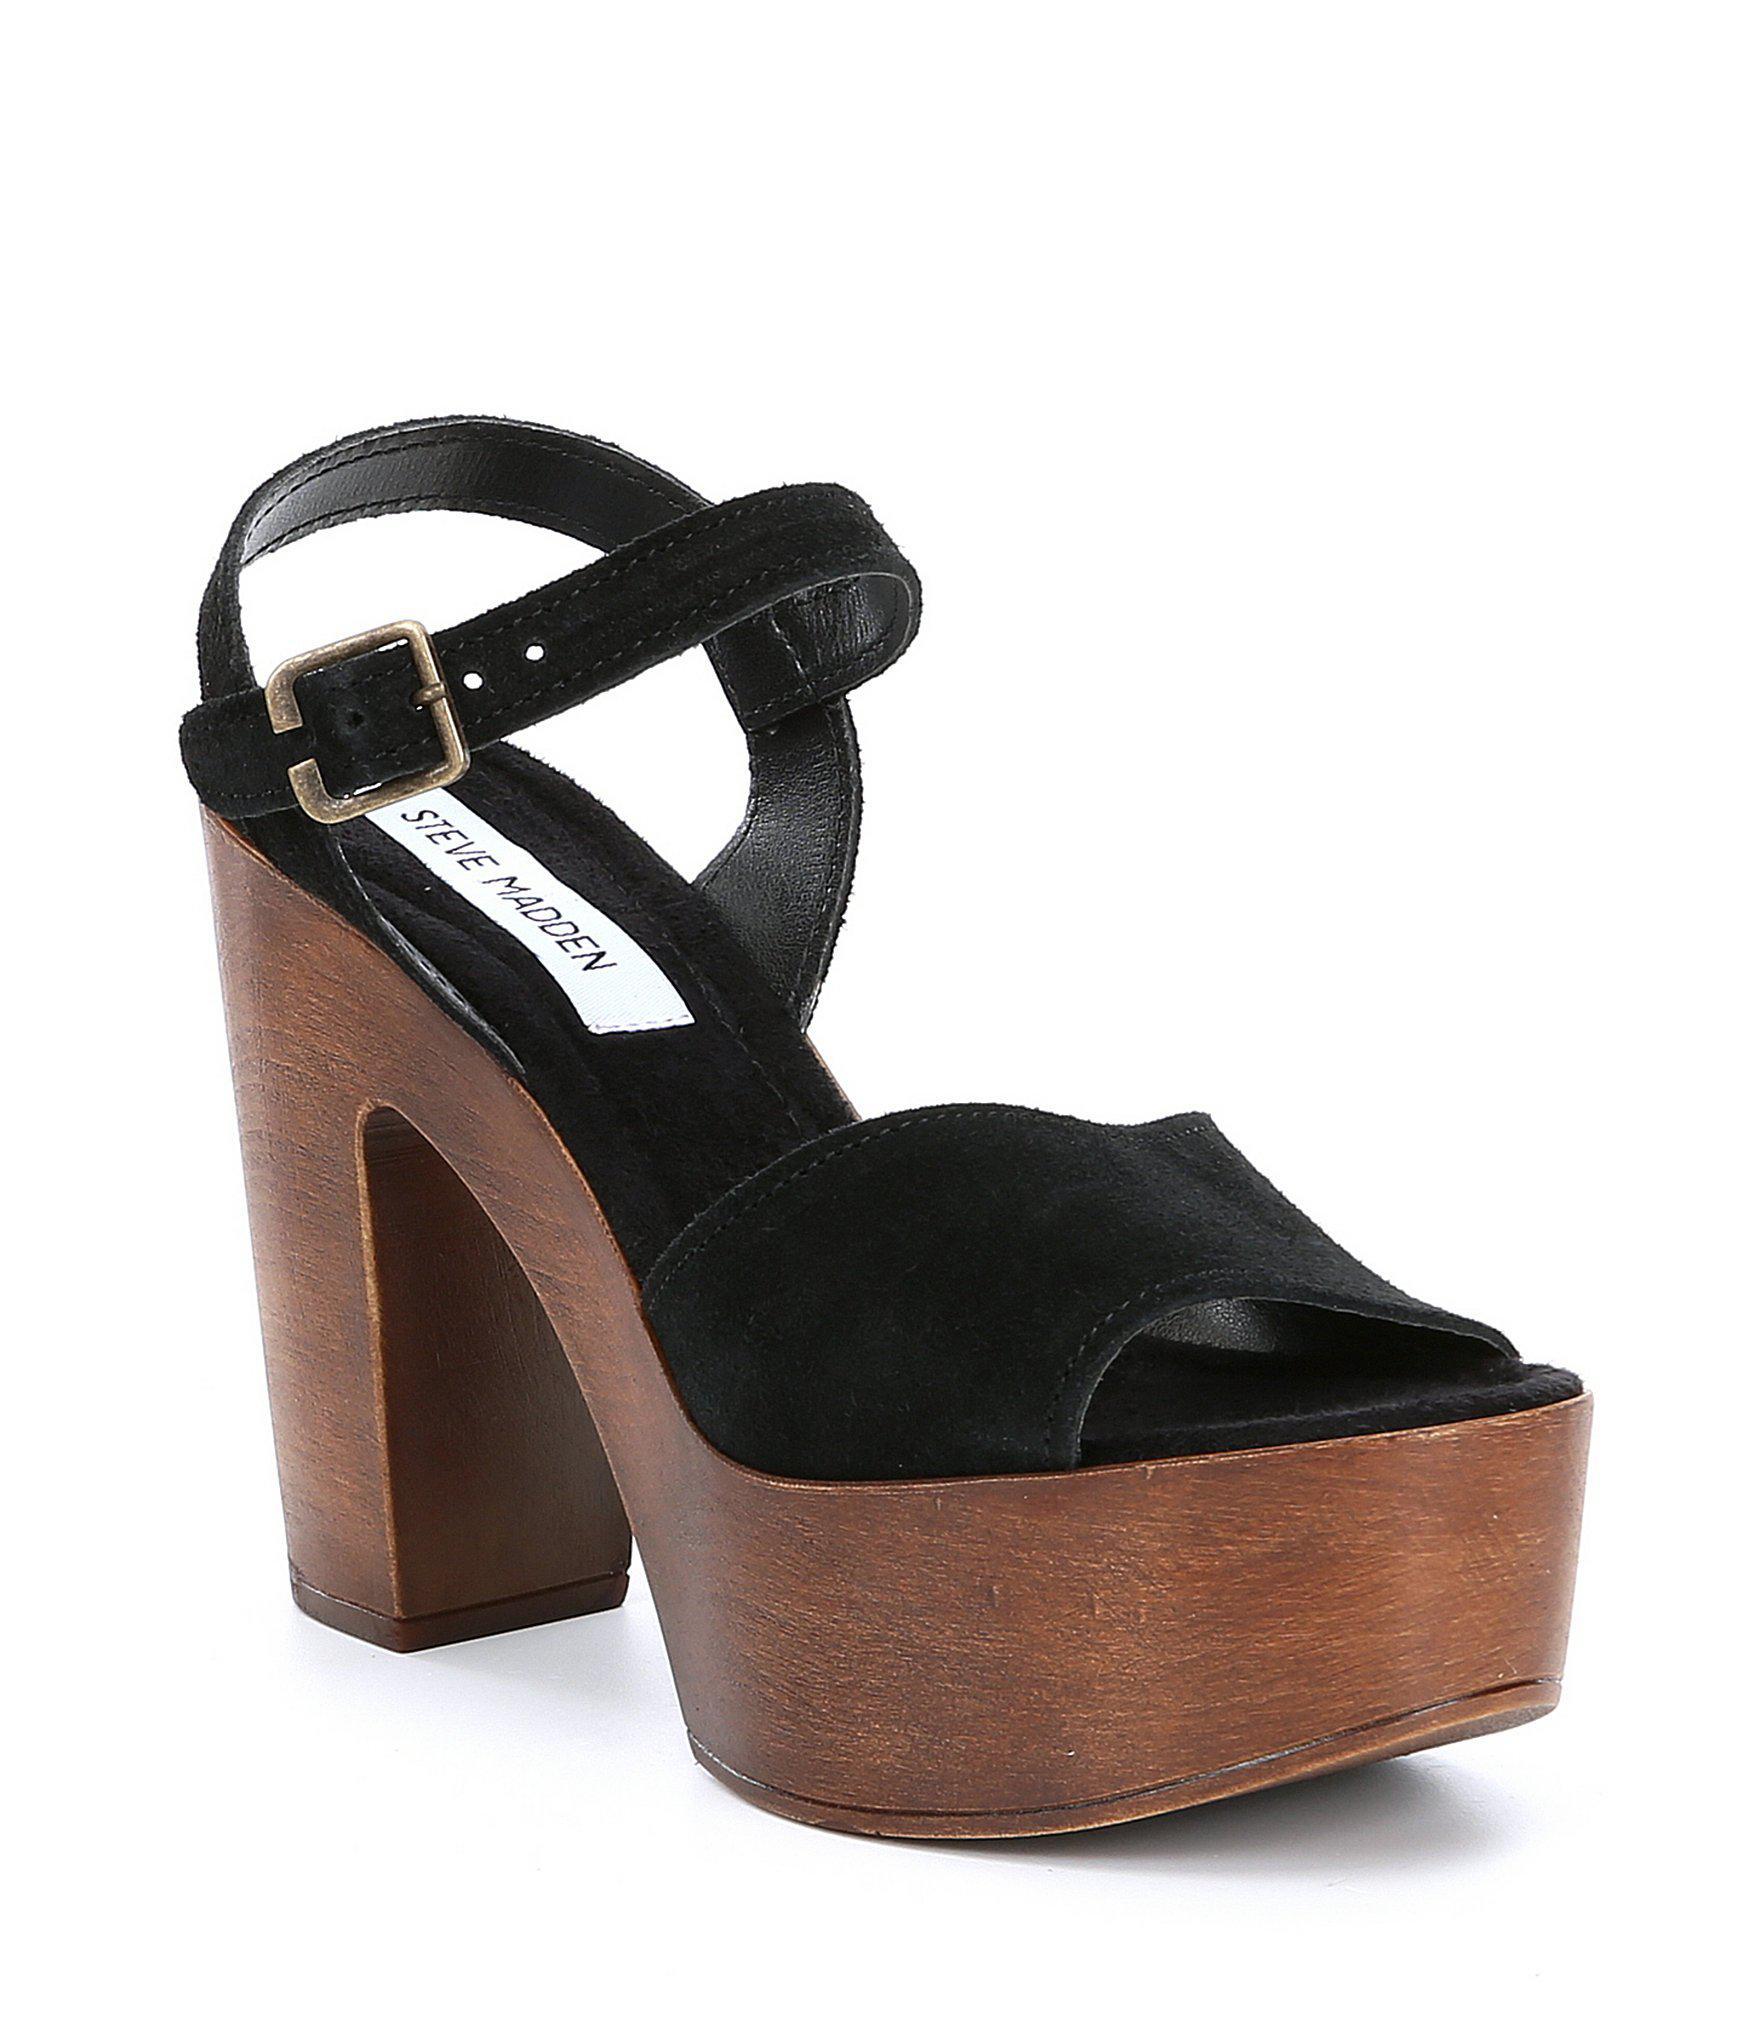 8d49fc9ffc9 Lyst - Steve Madden Lulla Suede Platform Block Heel Sandals in Black